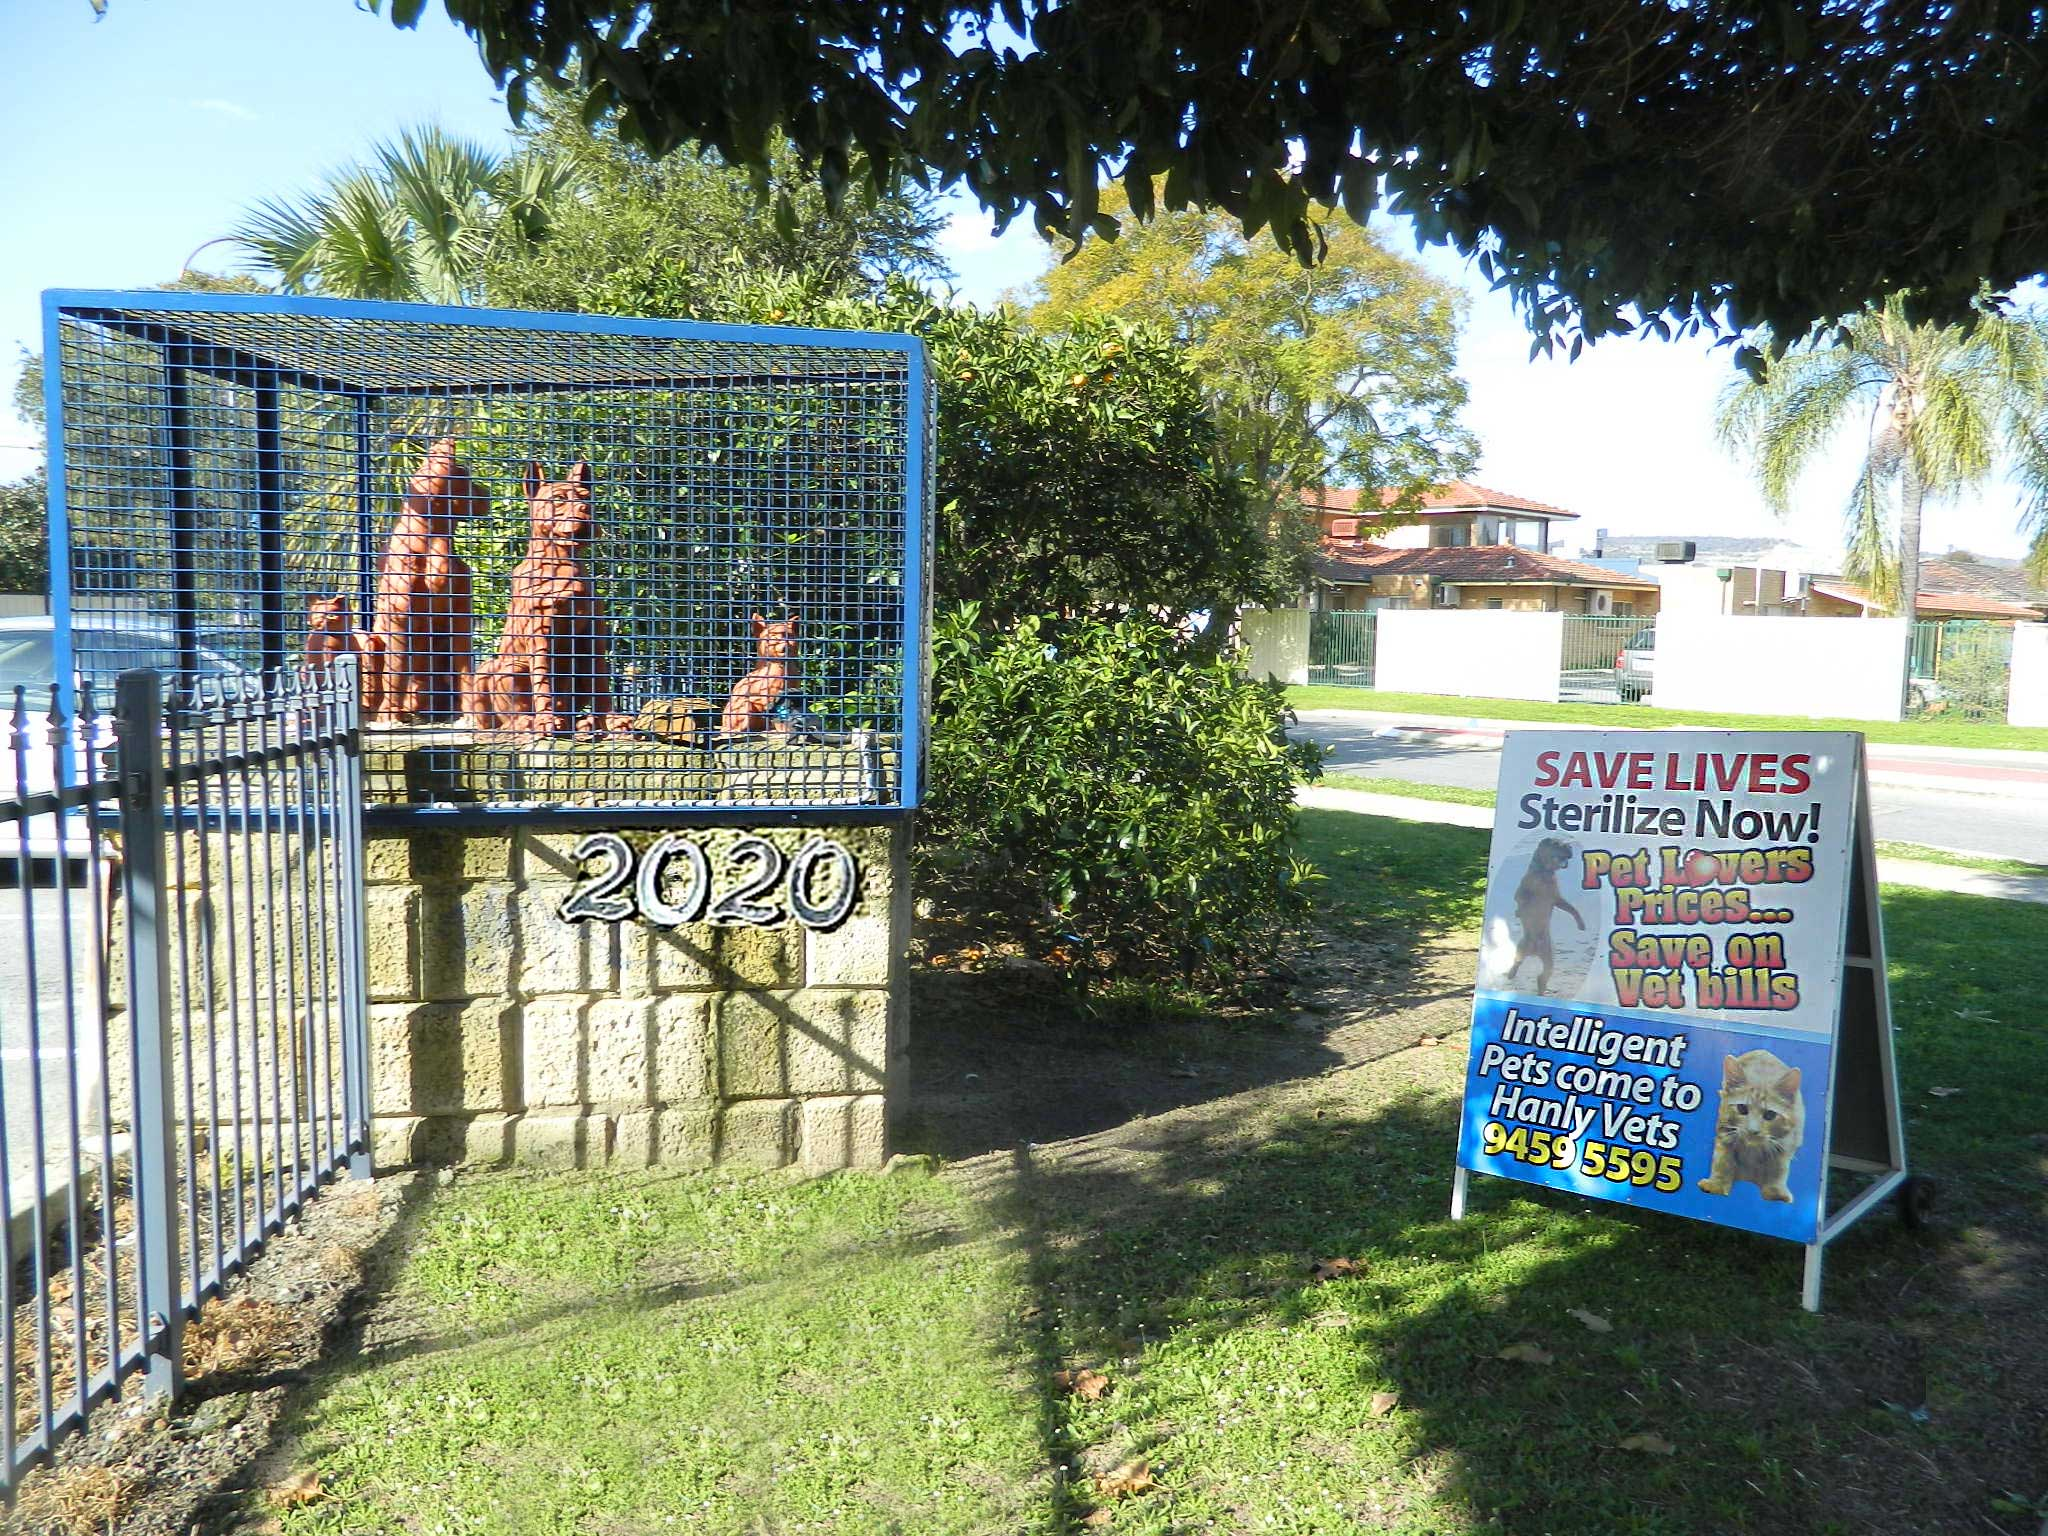 Breeders Sending Pets to Perth WA